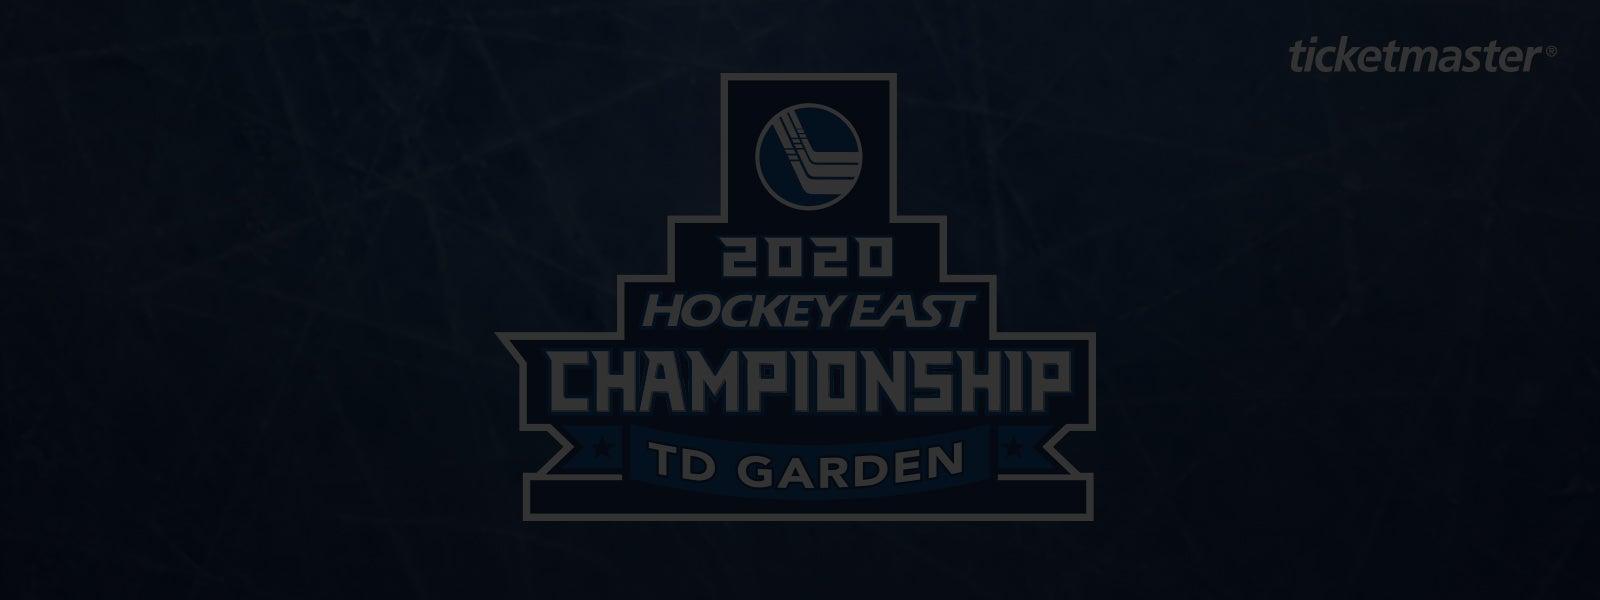 2020 Hockey East Championship